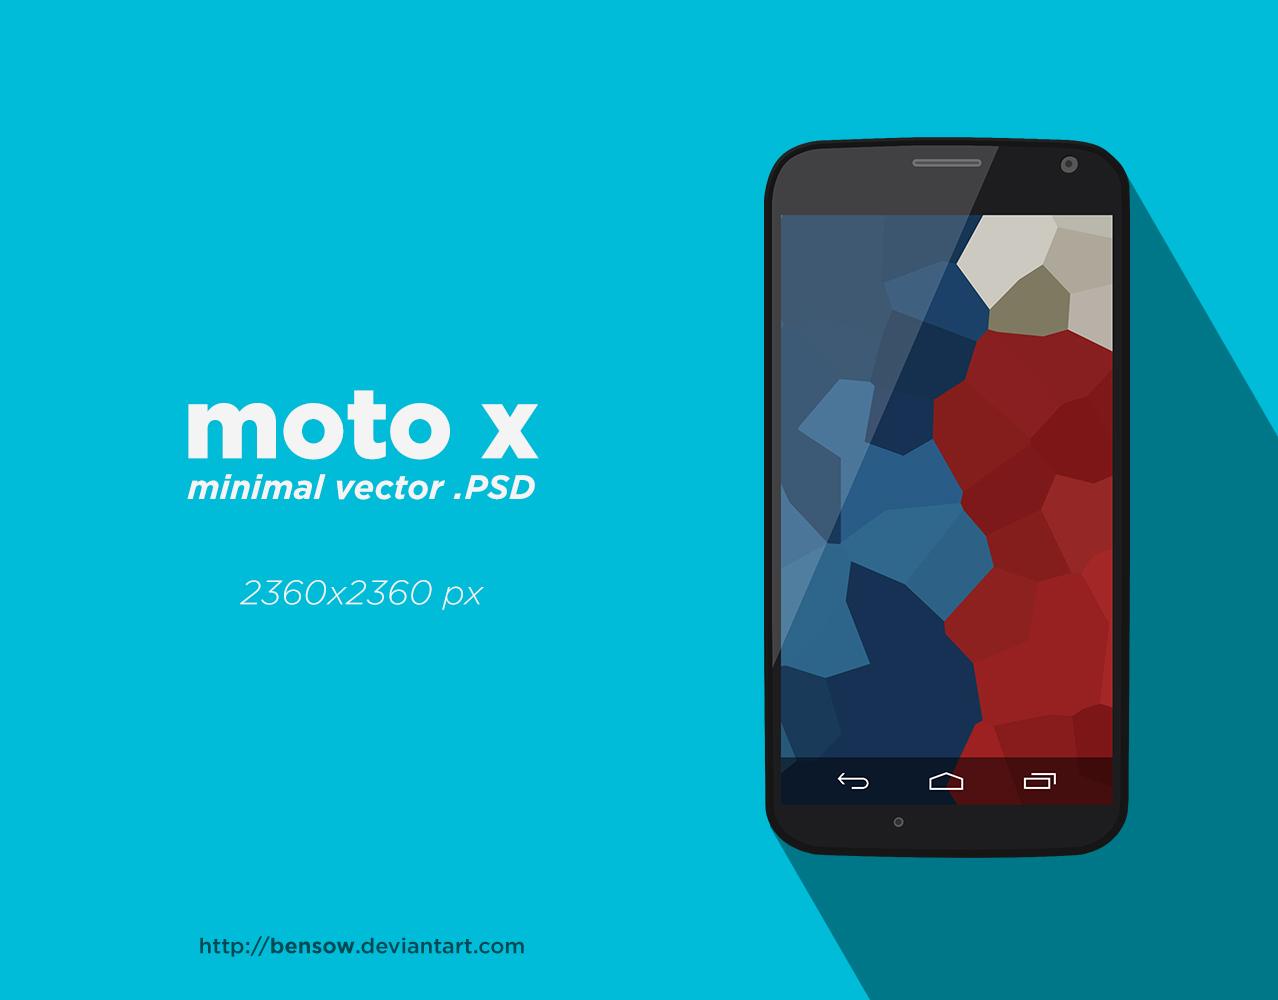 moto x Vetcor PSD by BenSow